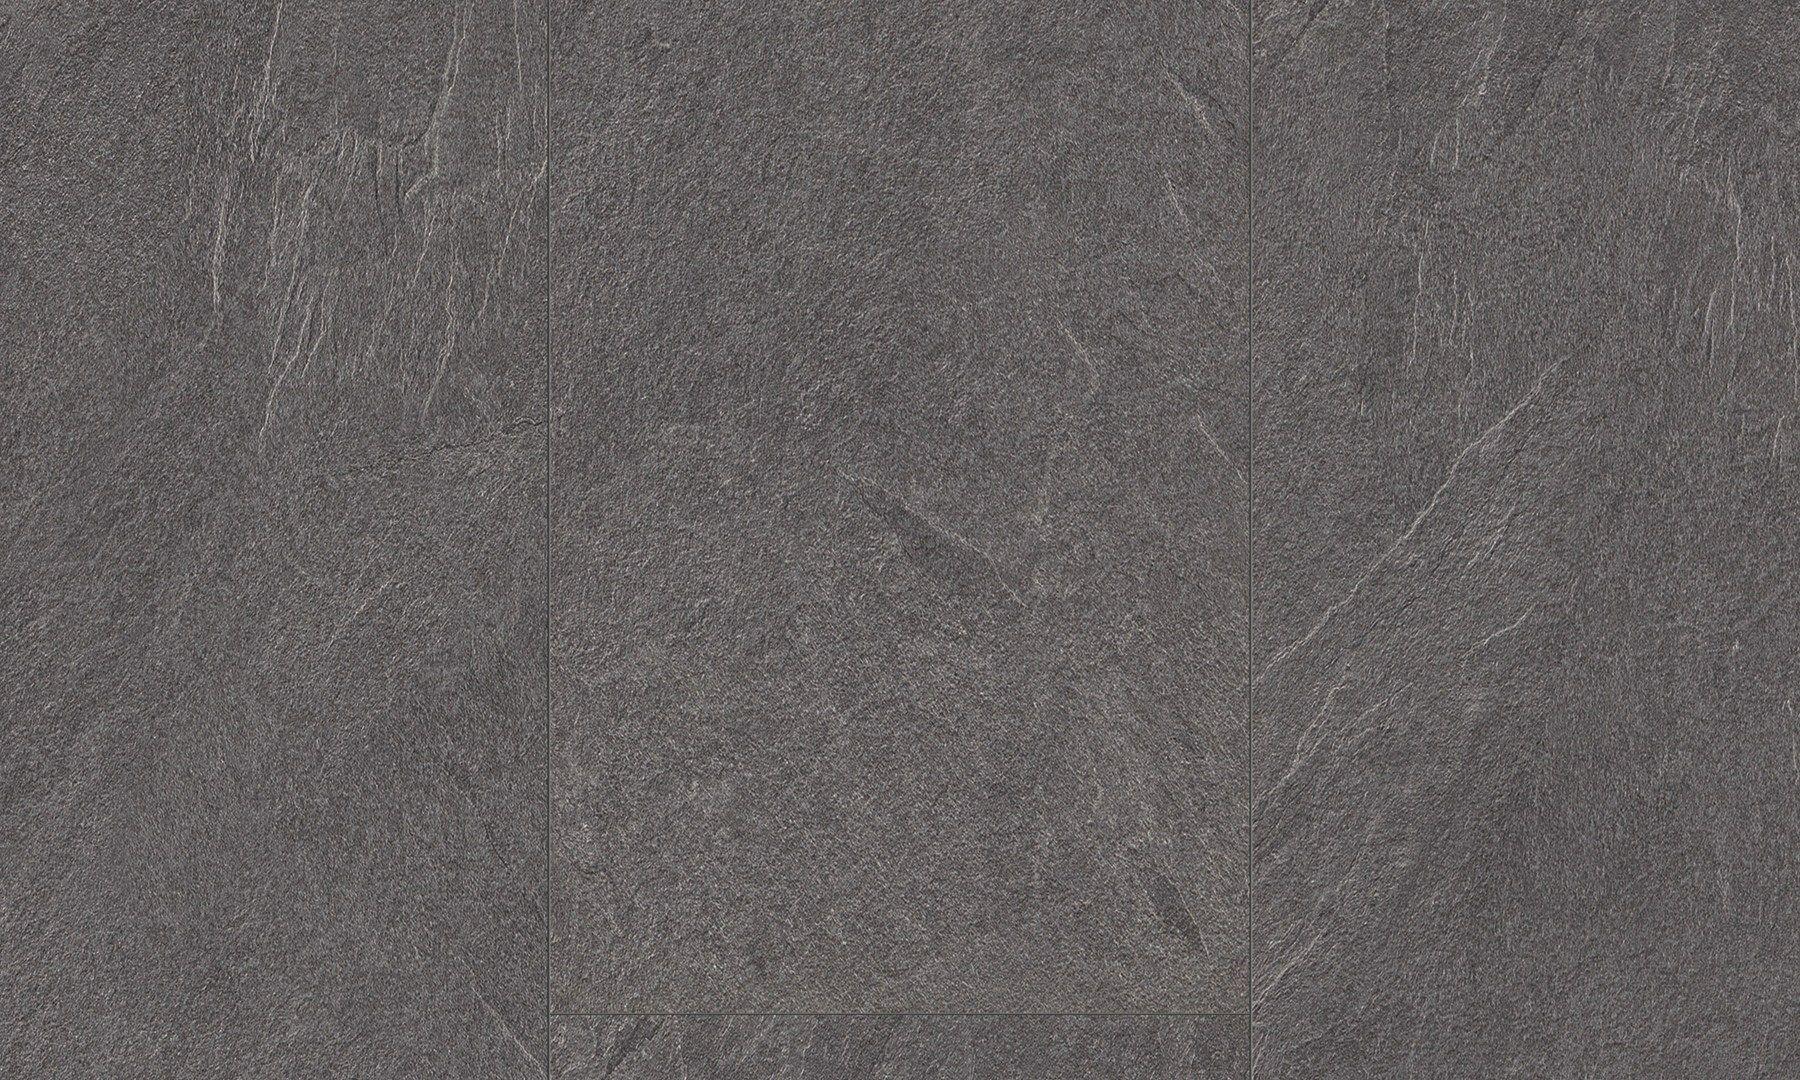 rev tement de sol en stratifi effet pierre ardoise gris. Black Bedroom Furniture Sets. Home Design Ideas